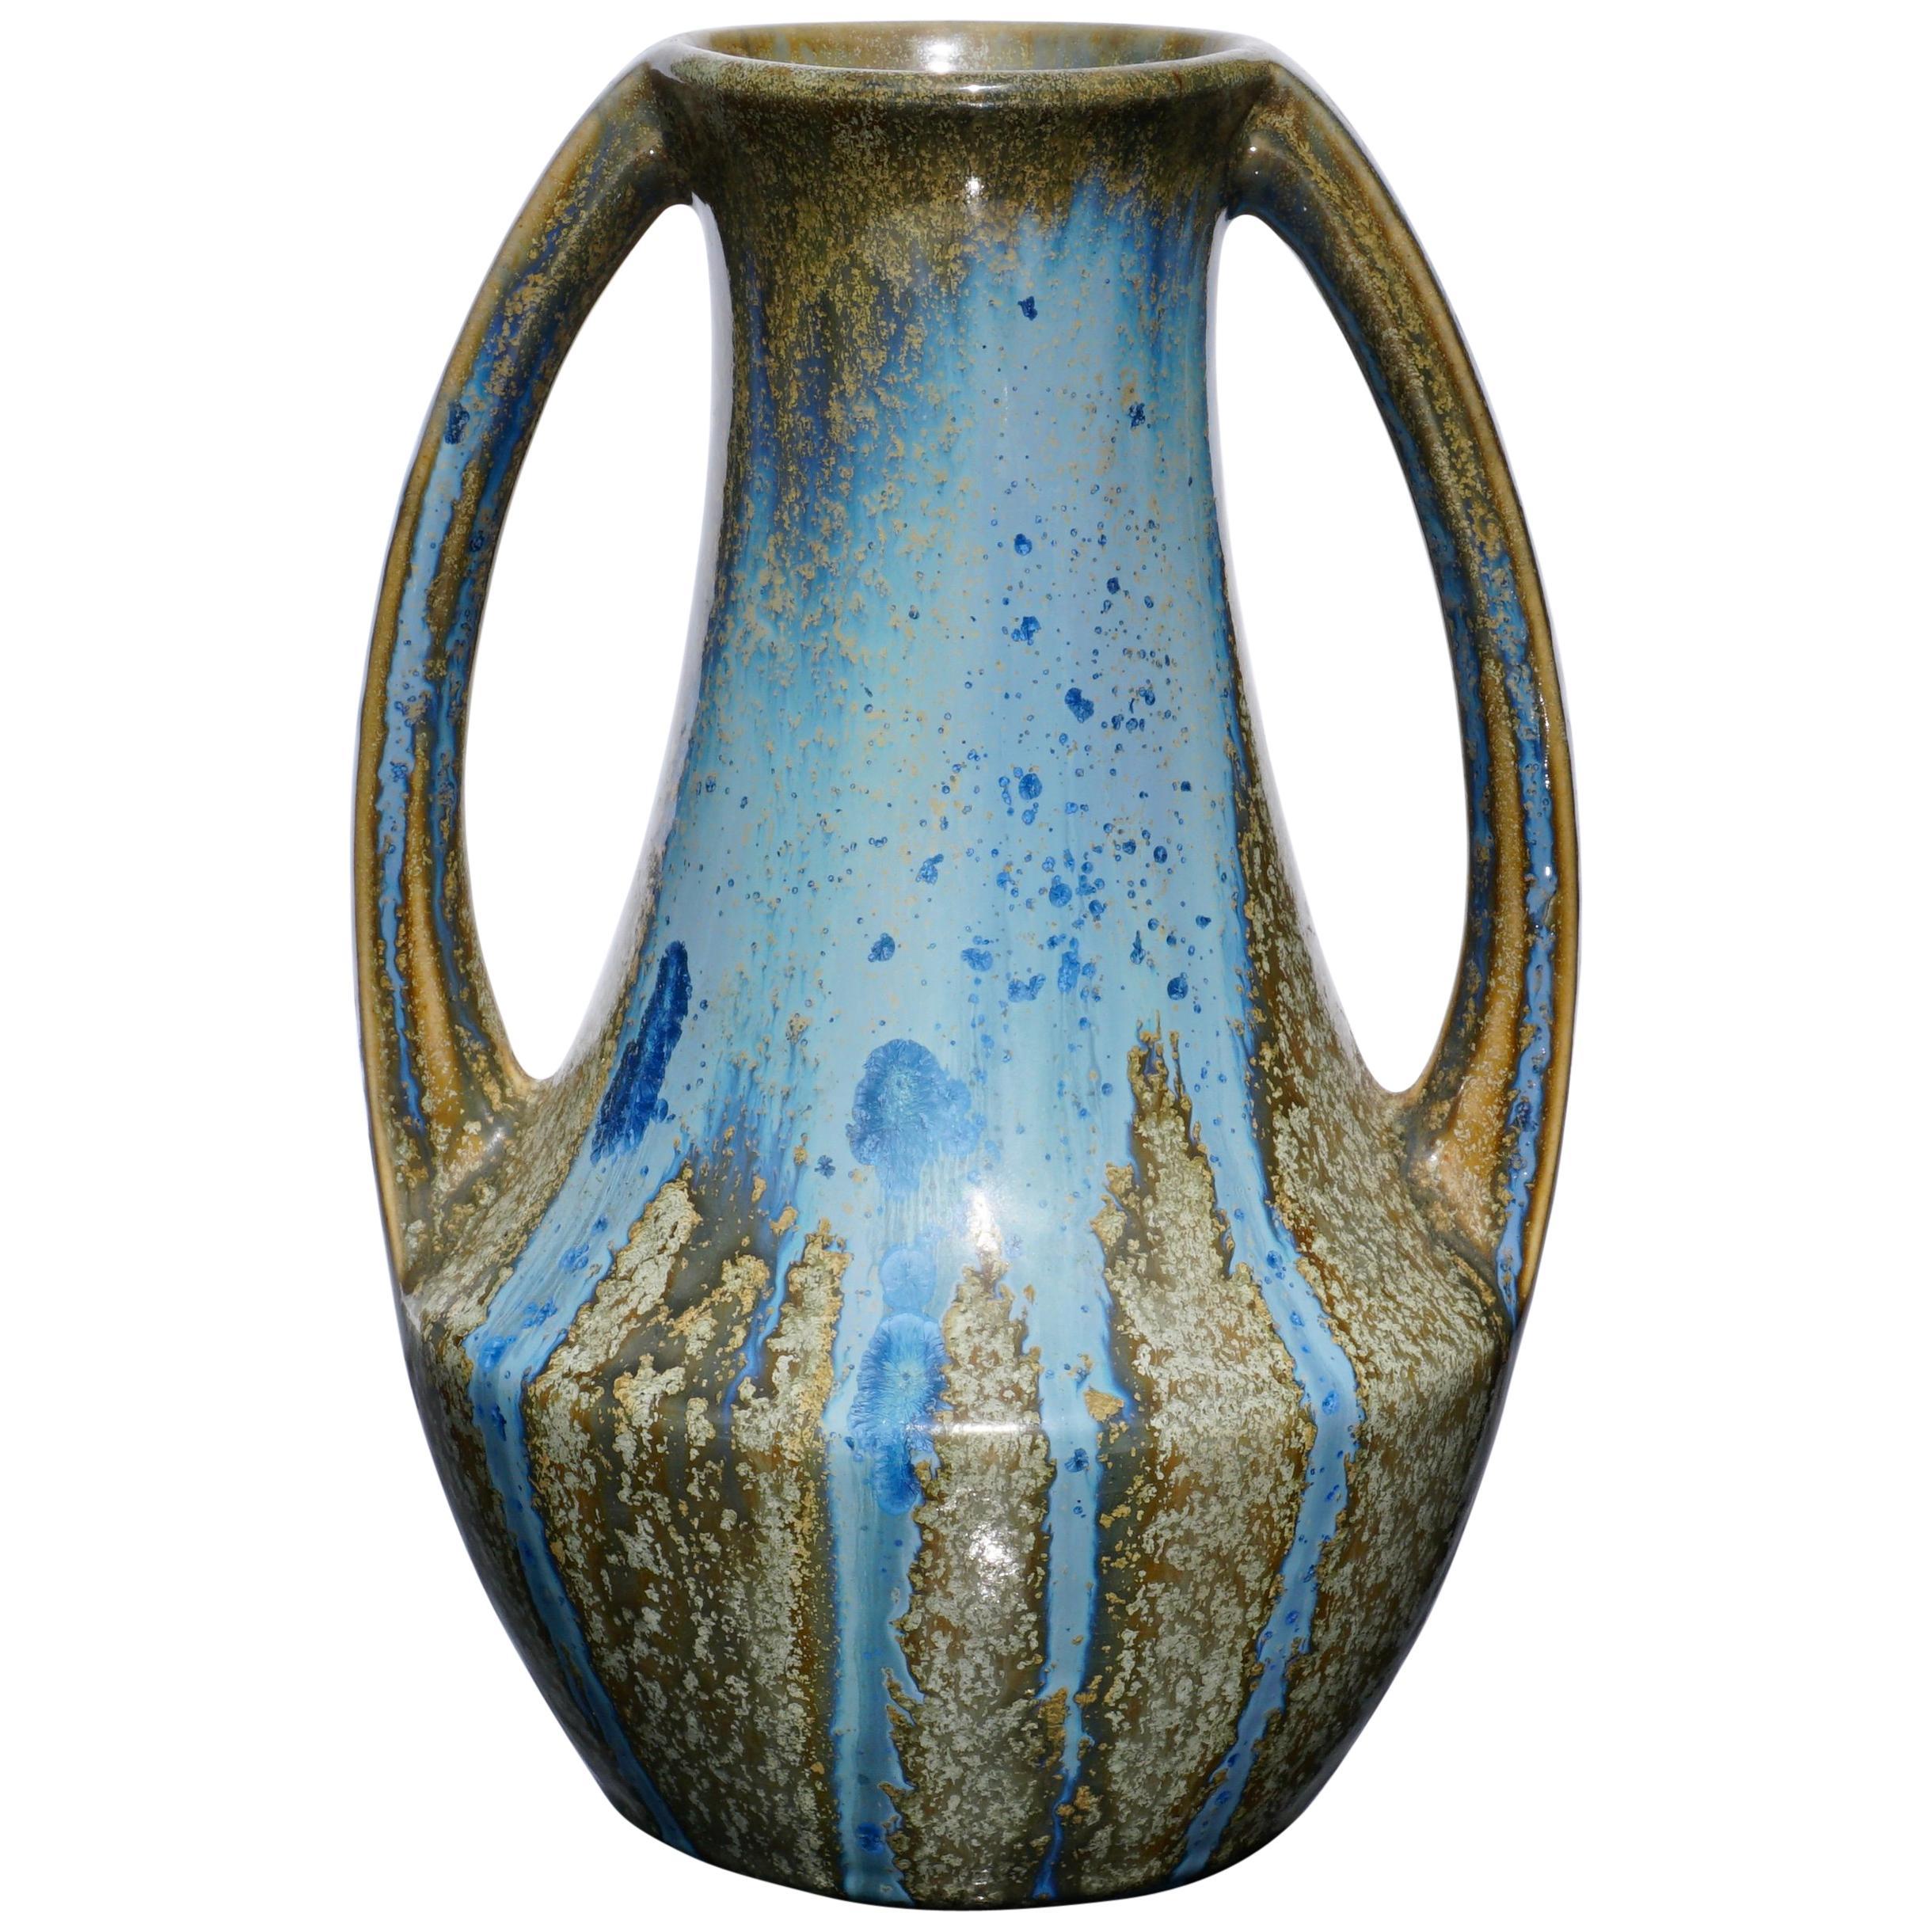 Pierrefonds Crystalline Art Nouveau Handled Vase